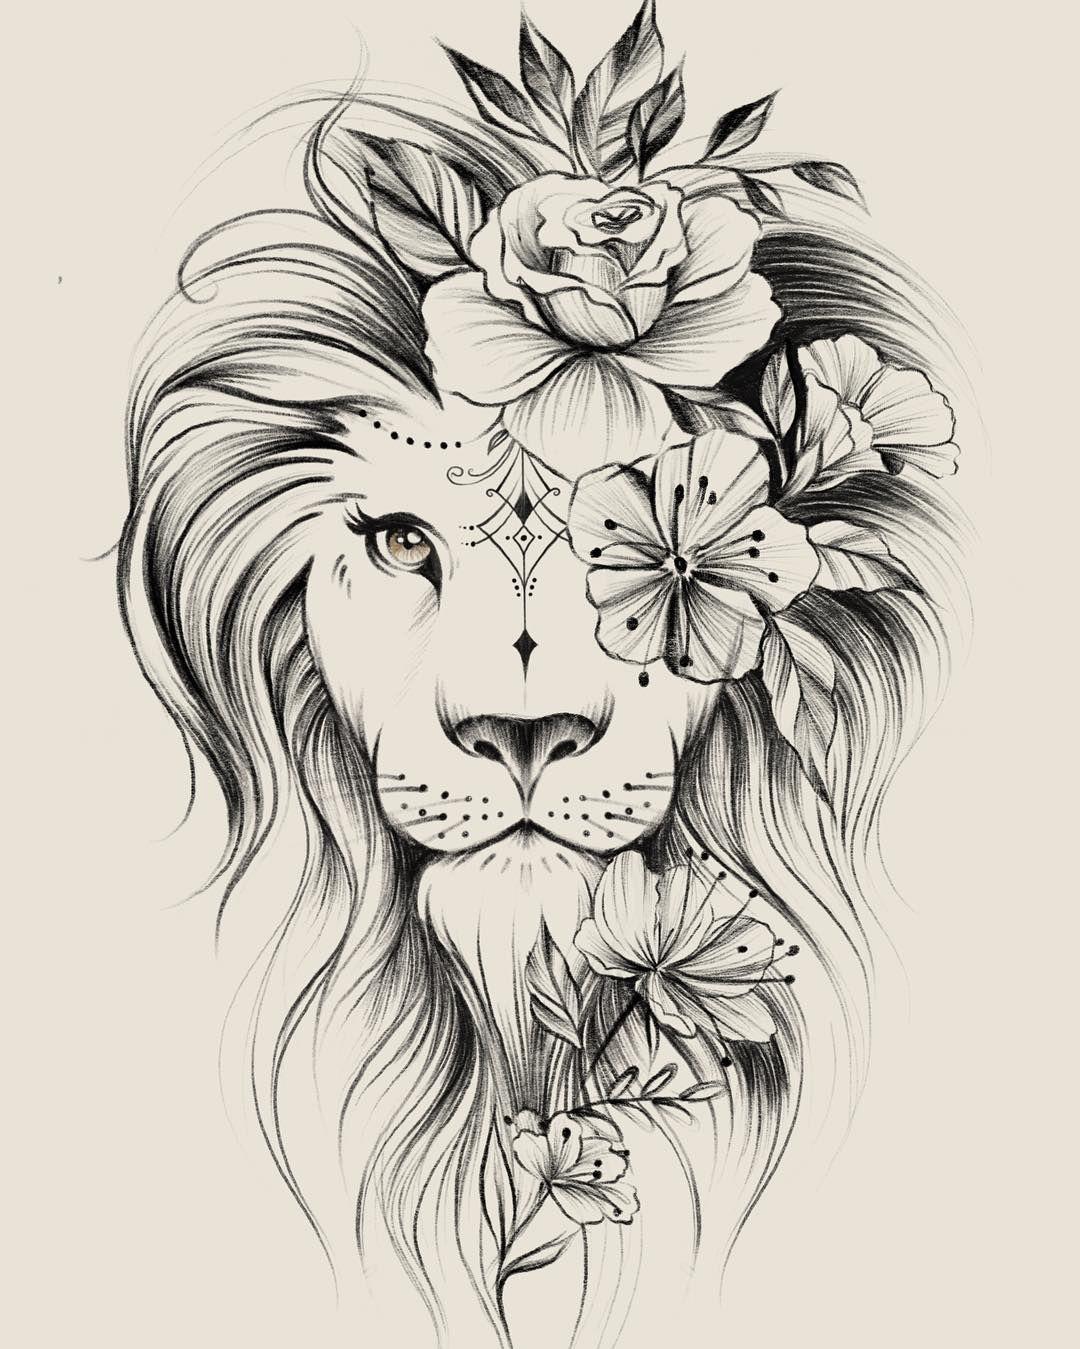 Leo Zodiac Horoscope Sign Symbol Tattoo Designs (118)